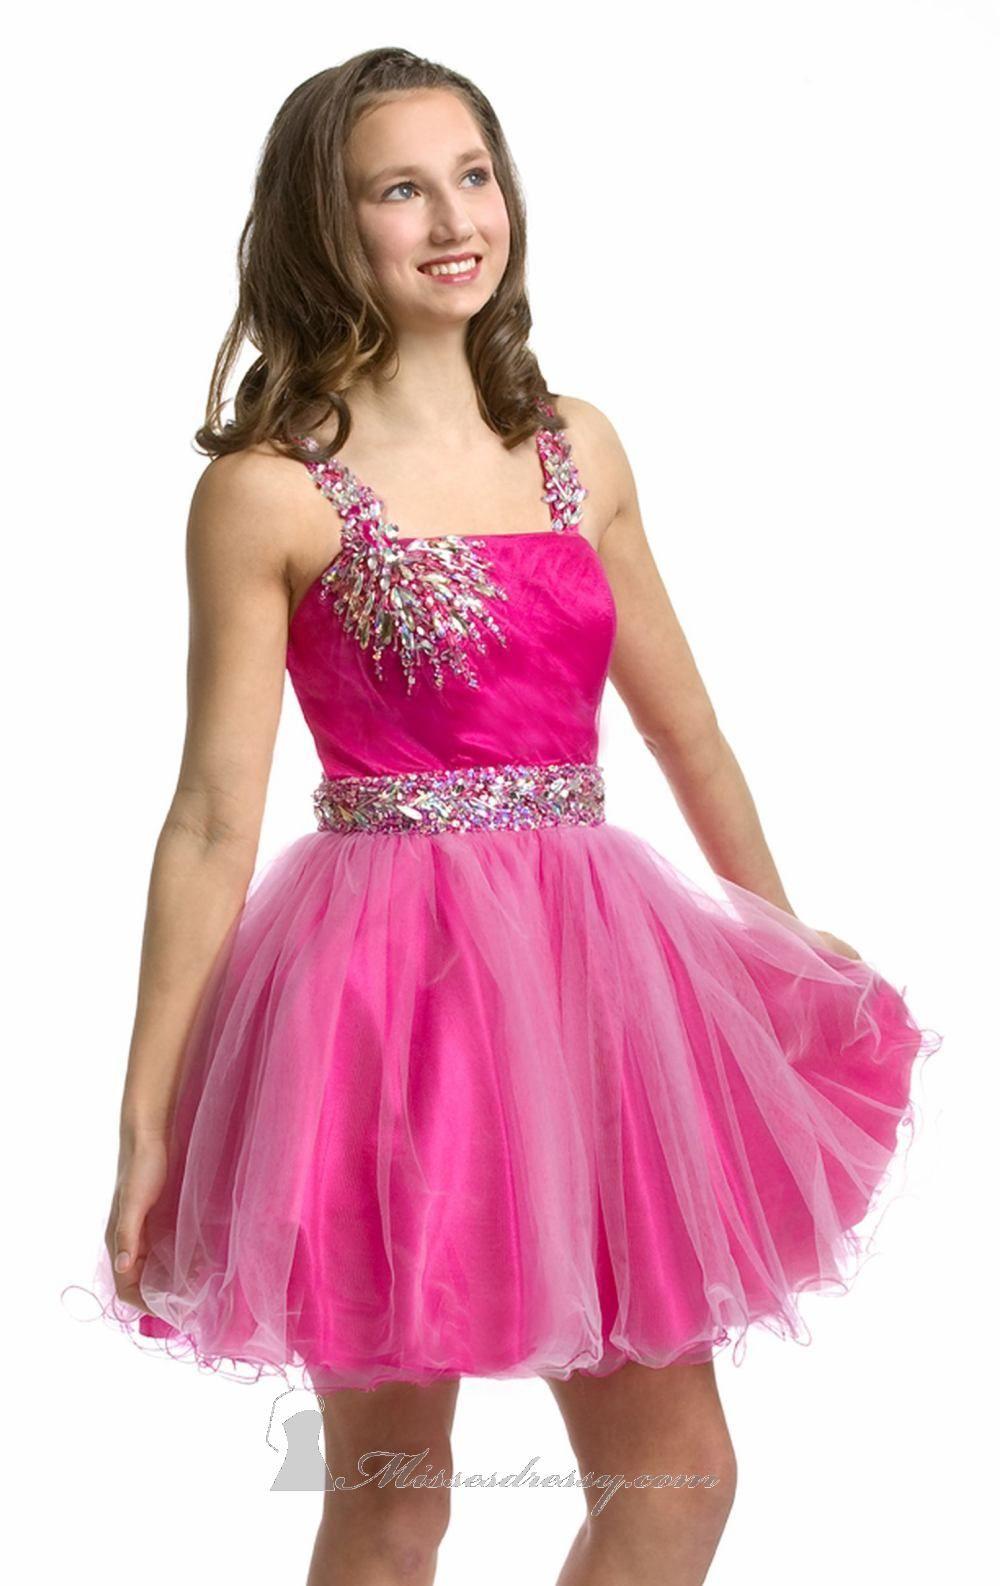 Party Time 1499 Dress - MissesDressy.com | Kids\' Dresses | Pinterest